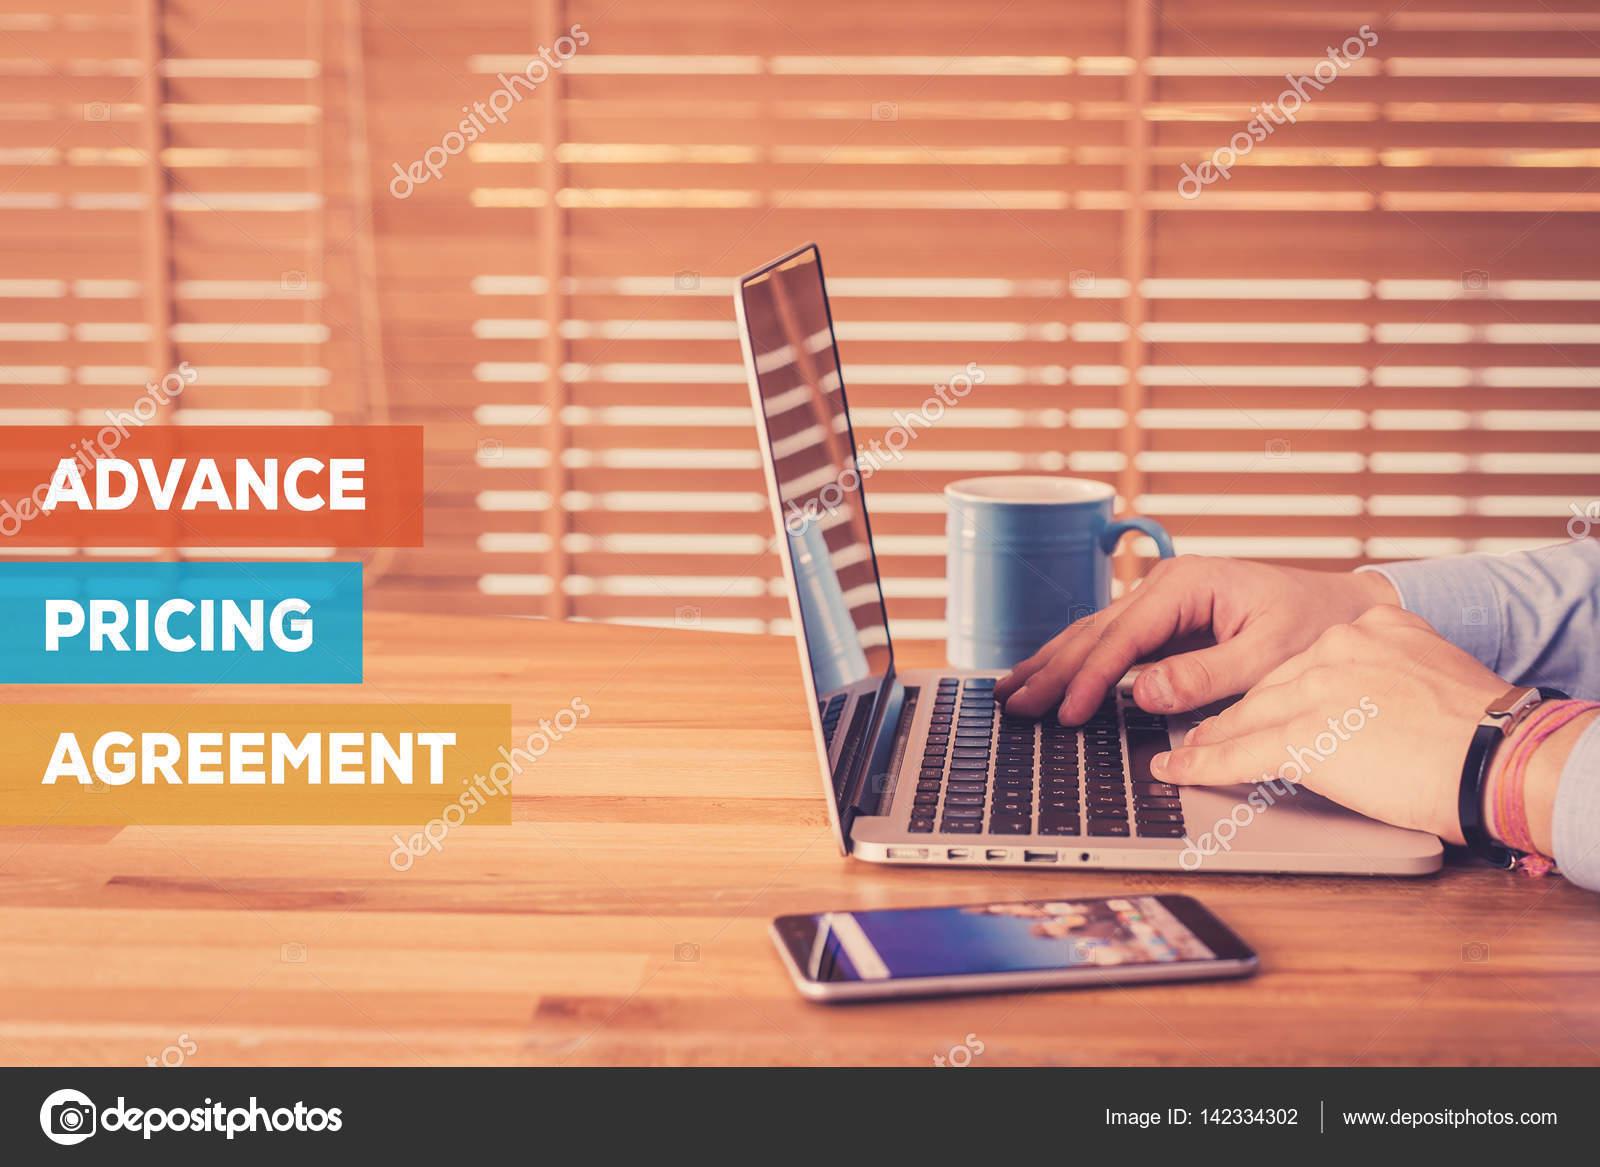 Advance Pricing Agreement Concept Stock Photo Garagestock 142334302